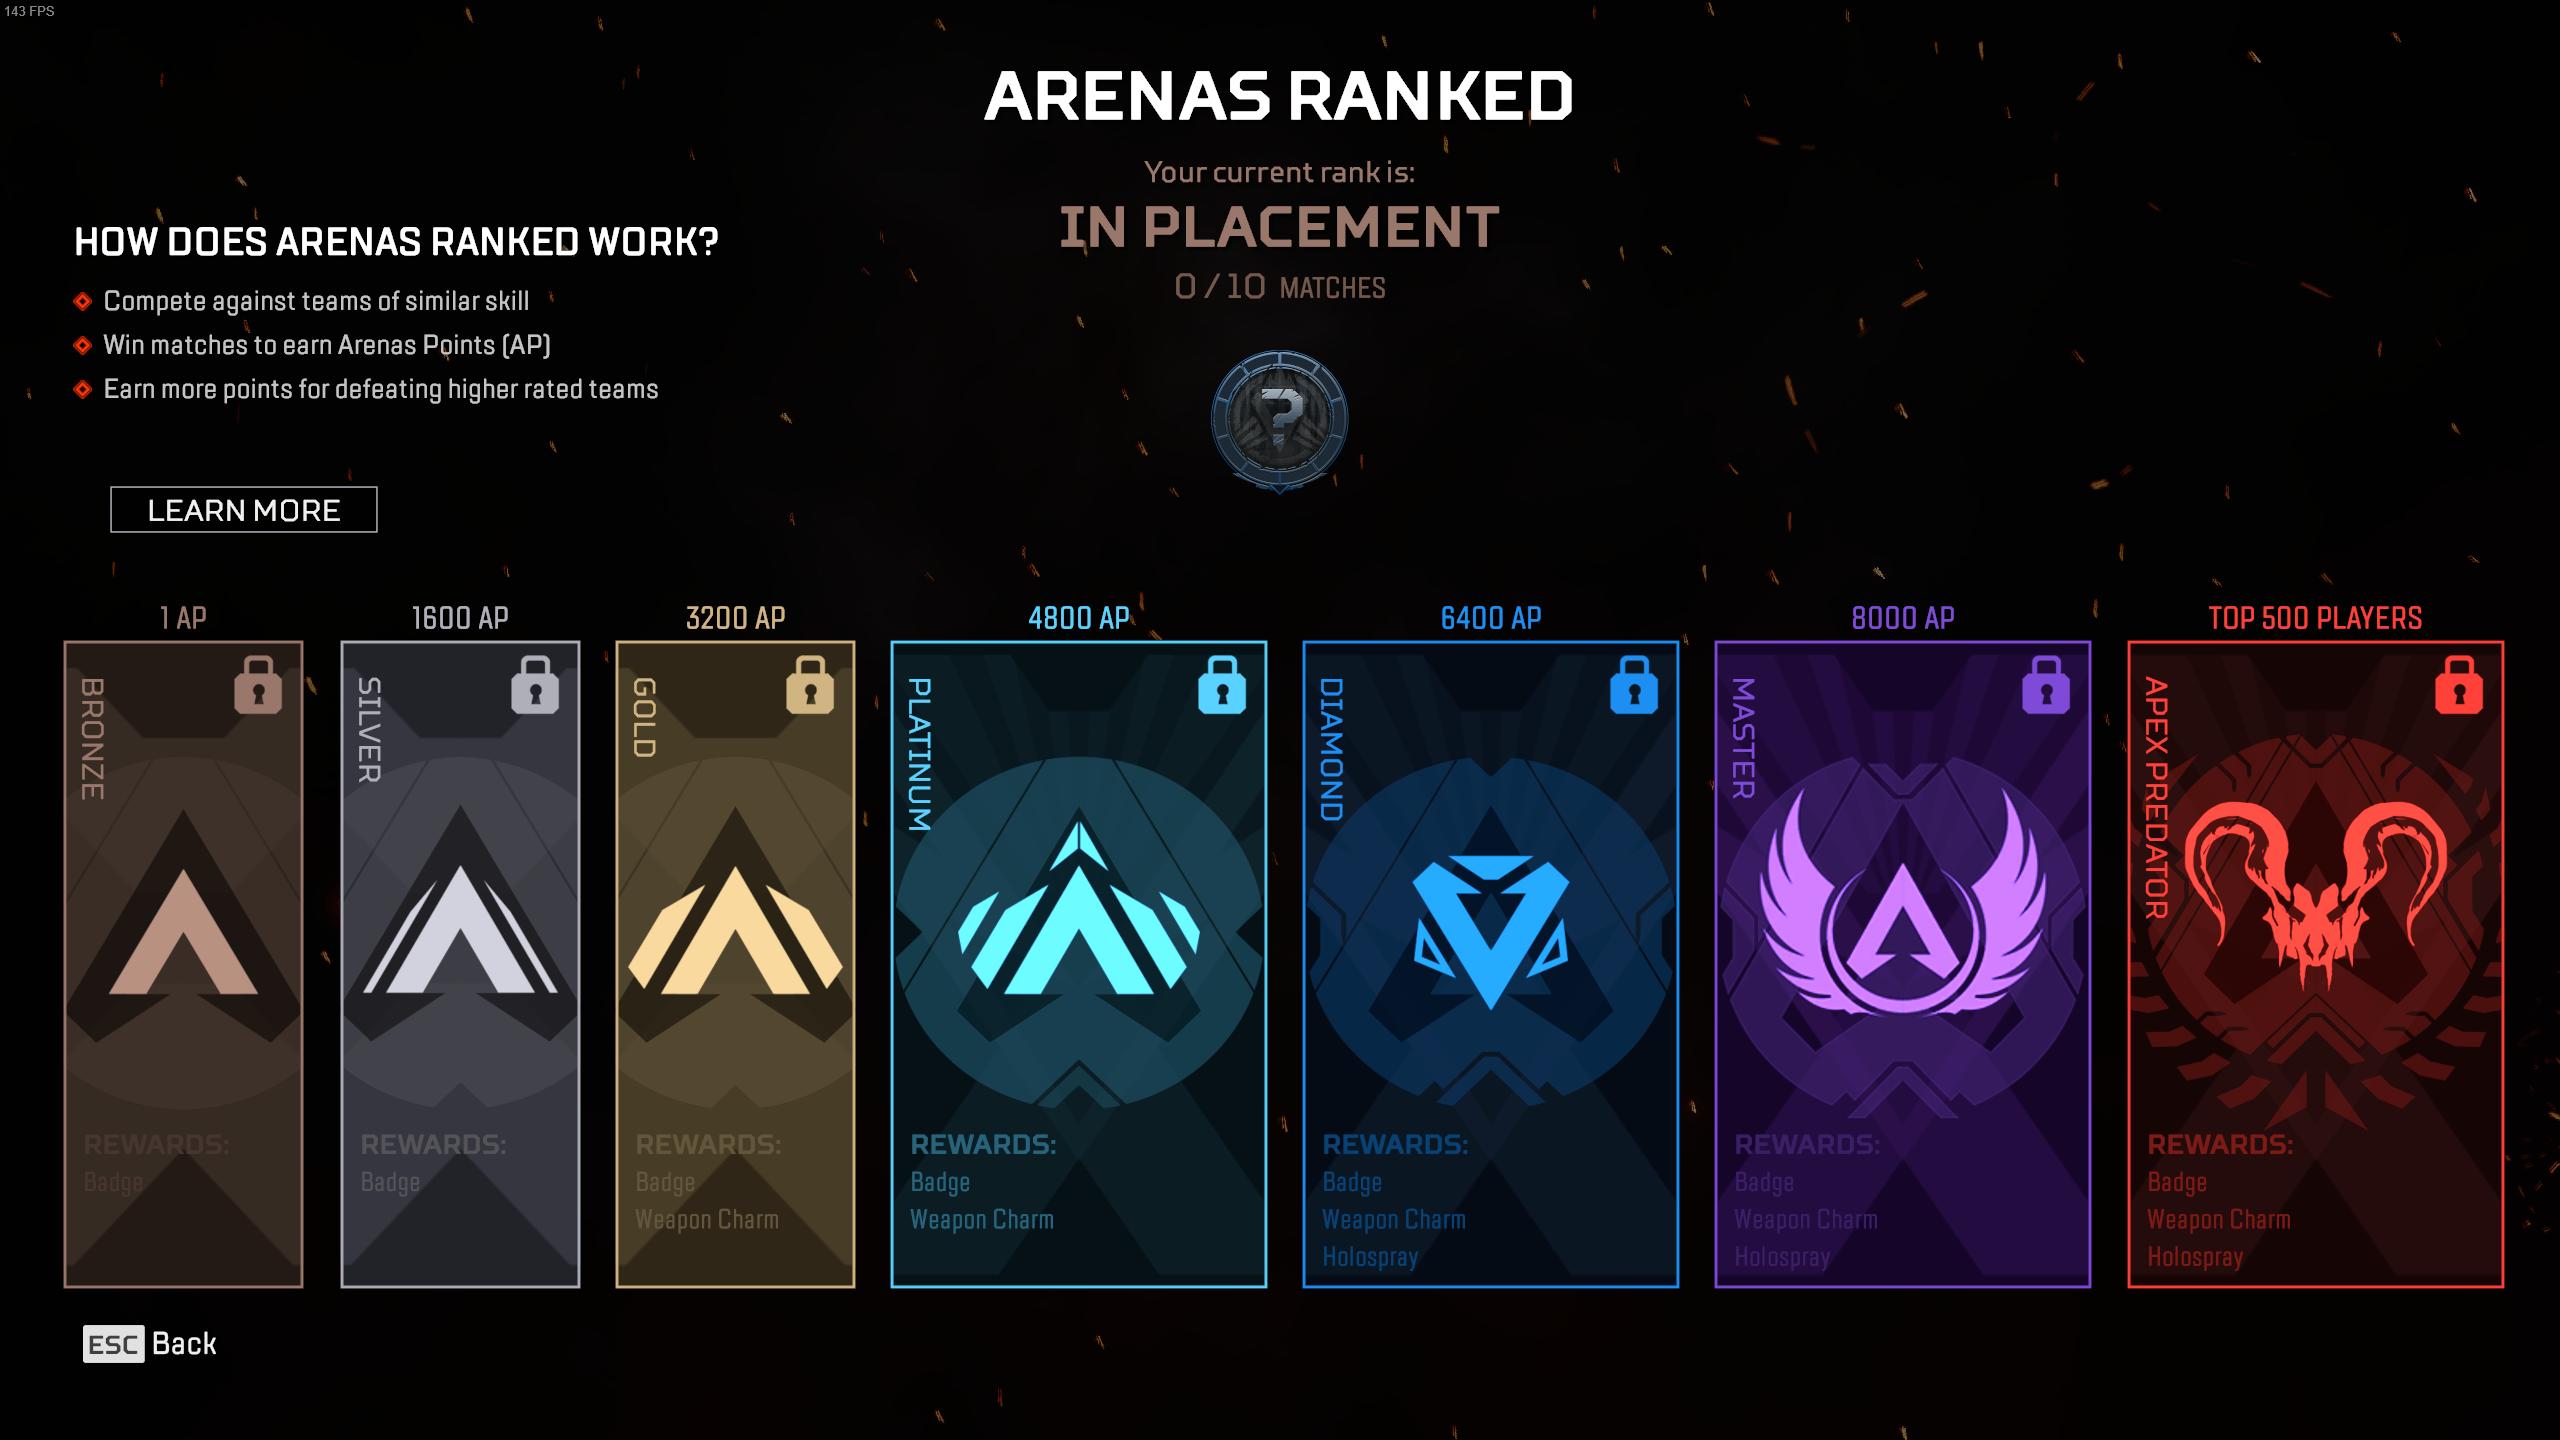 apex legends ranked arena